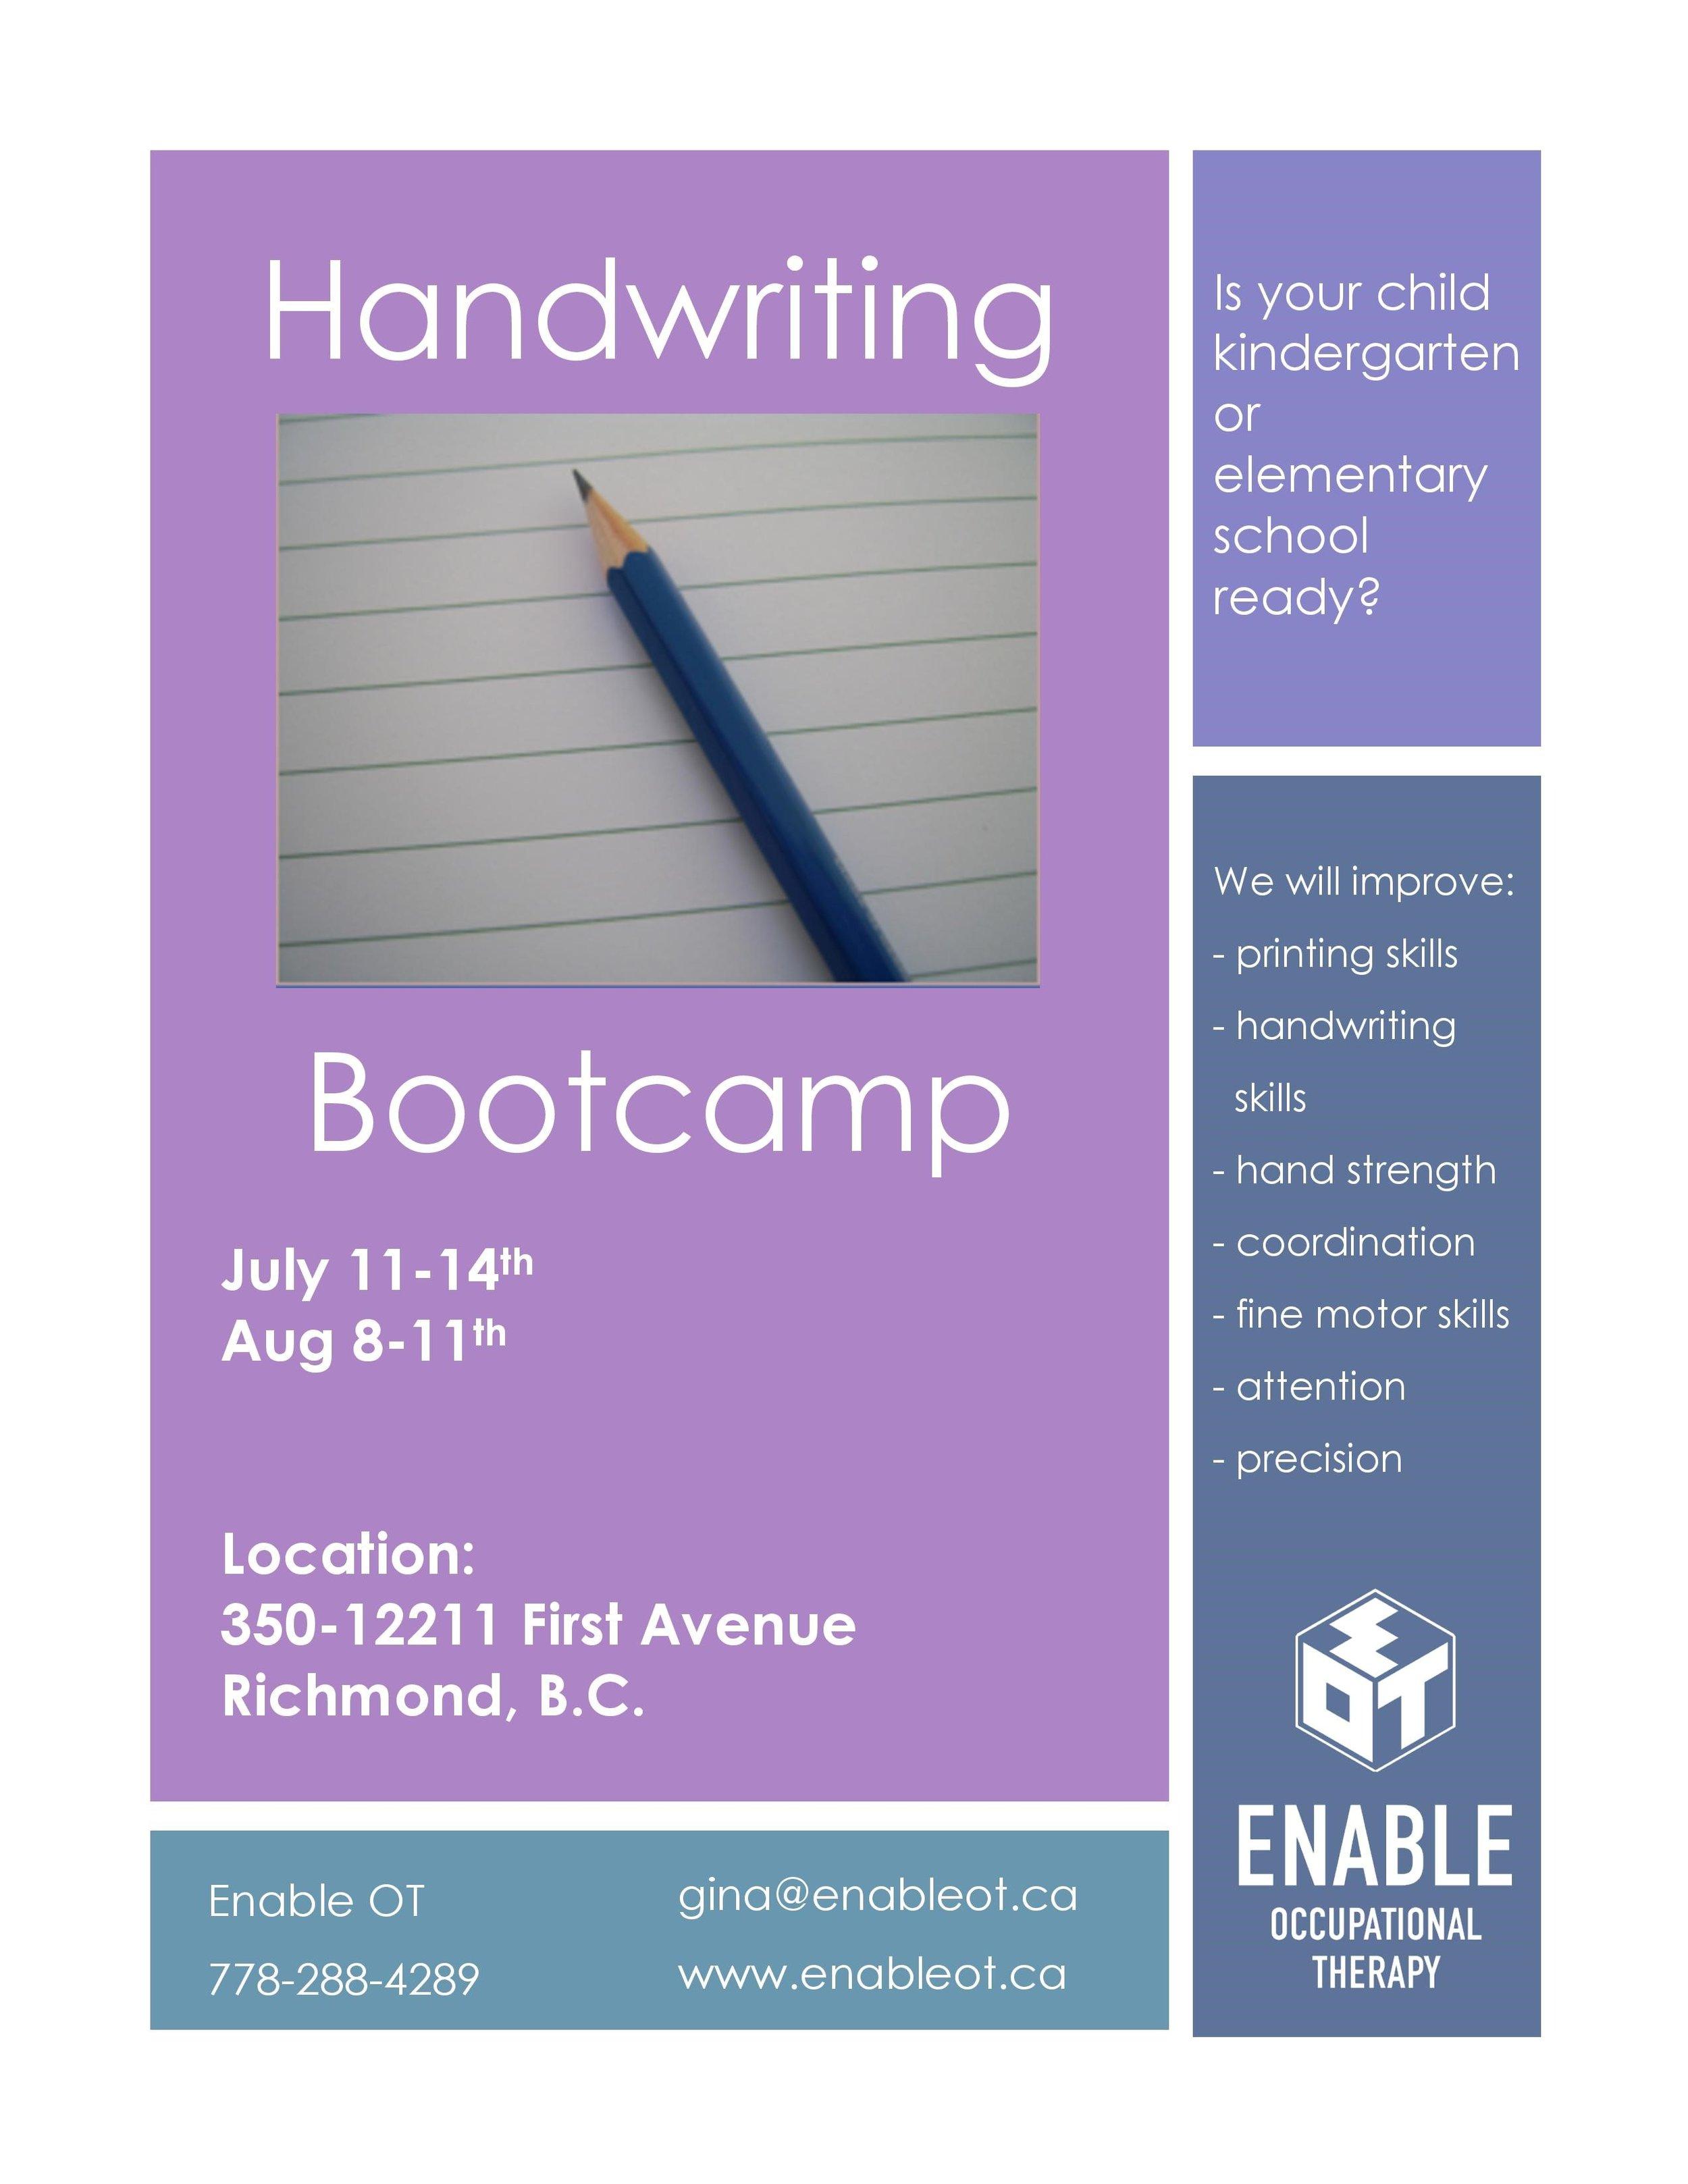 handwriting bootcamp flyer 2017